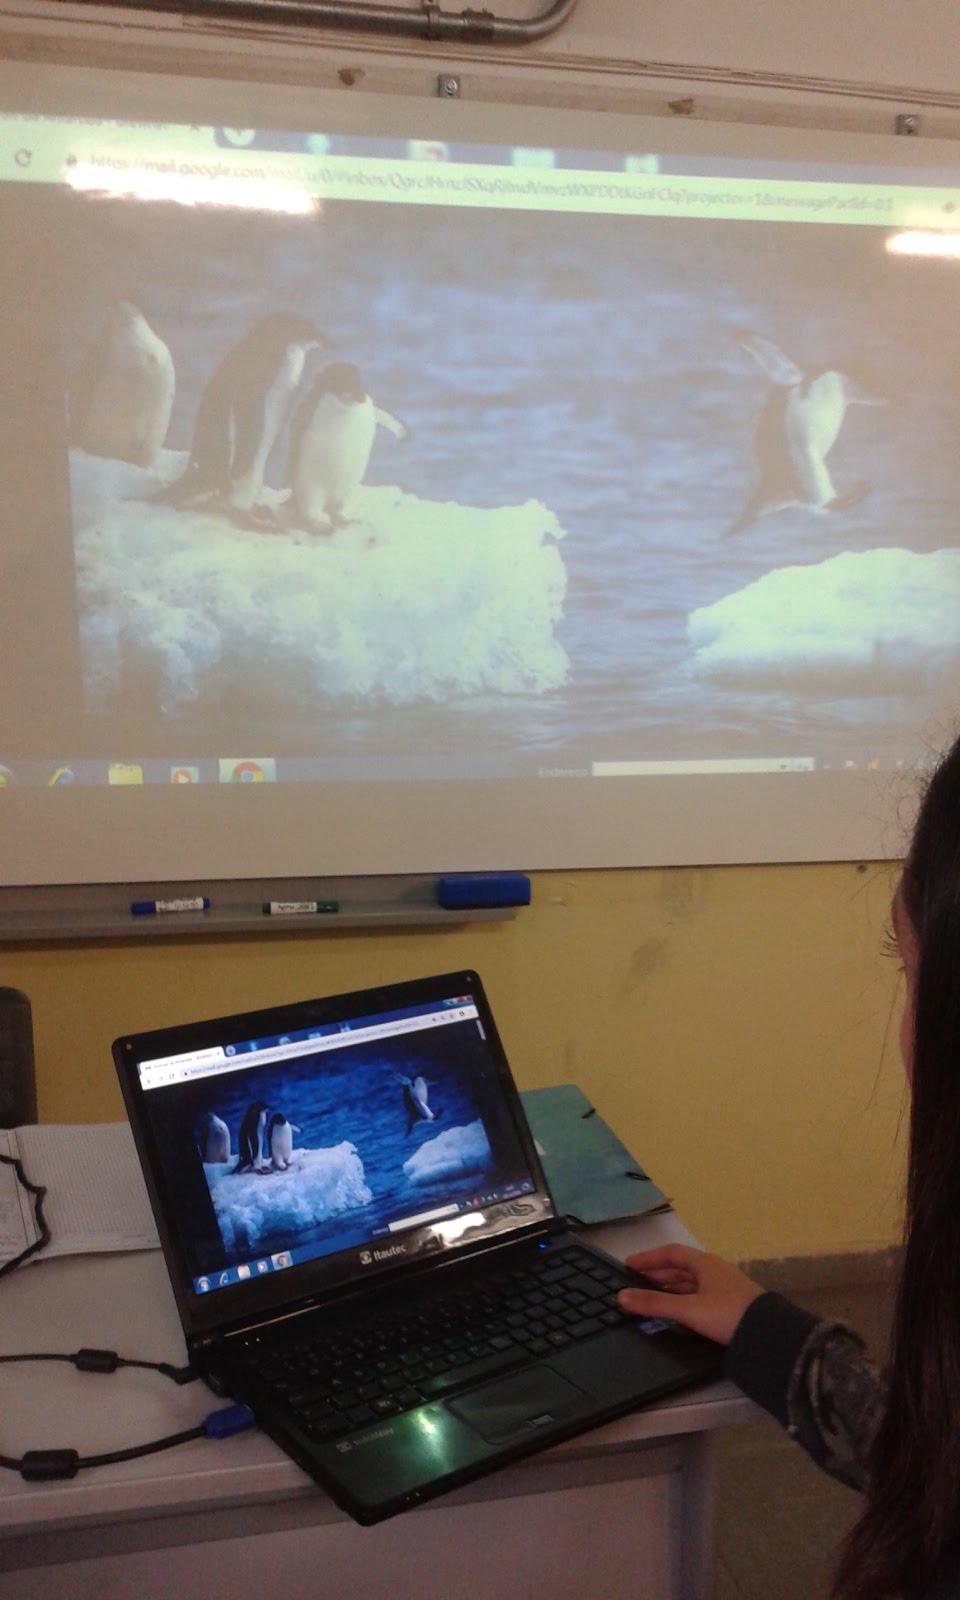 Antártica no Ensino Médio Integral